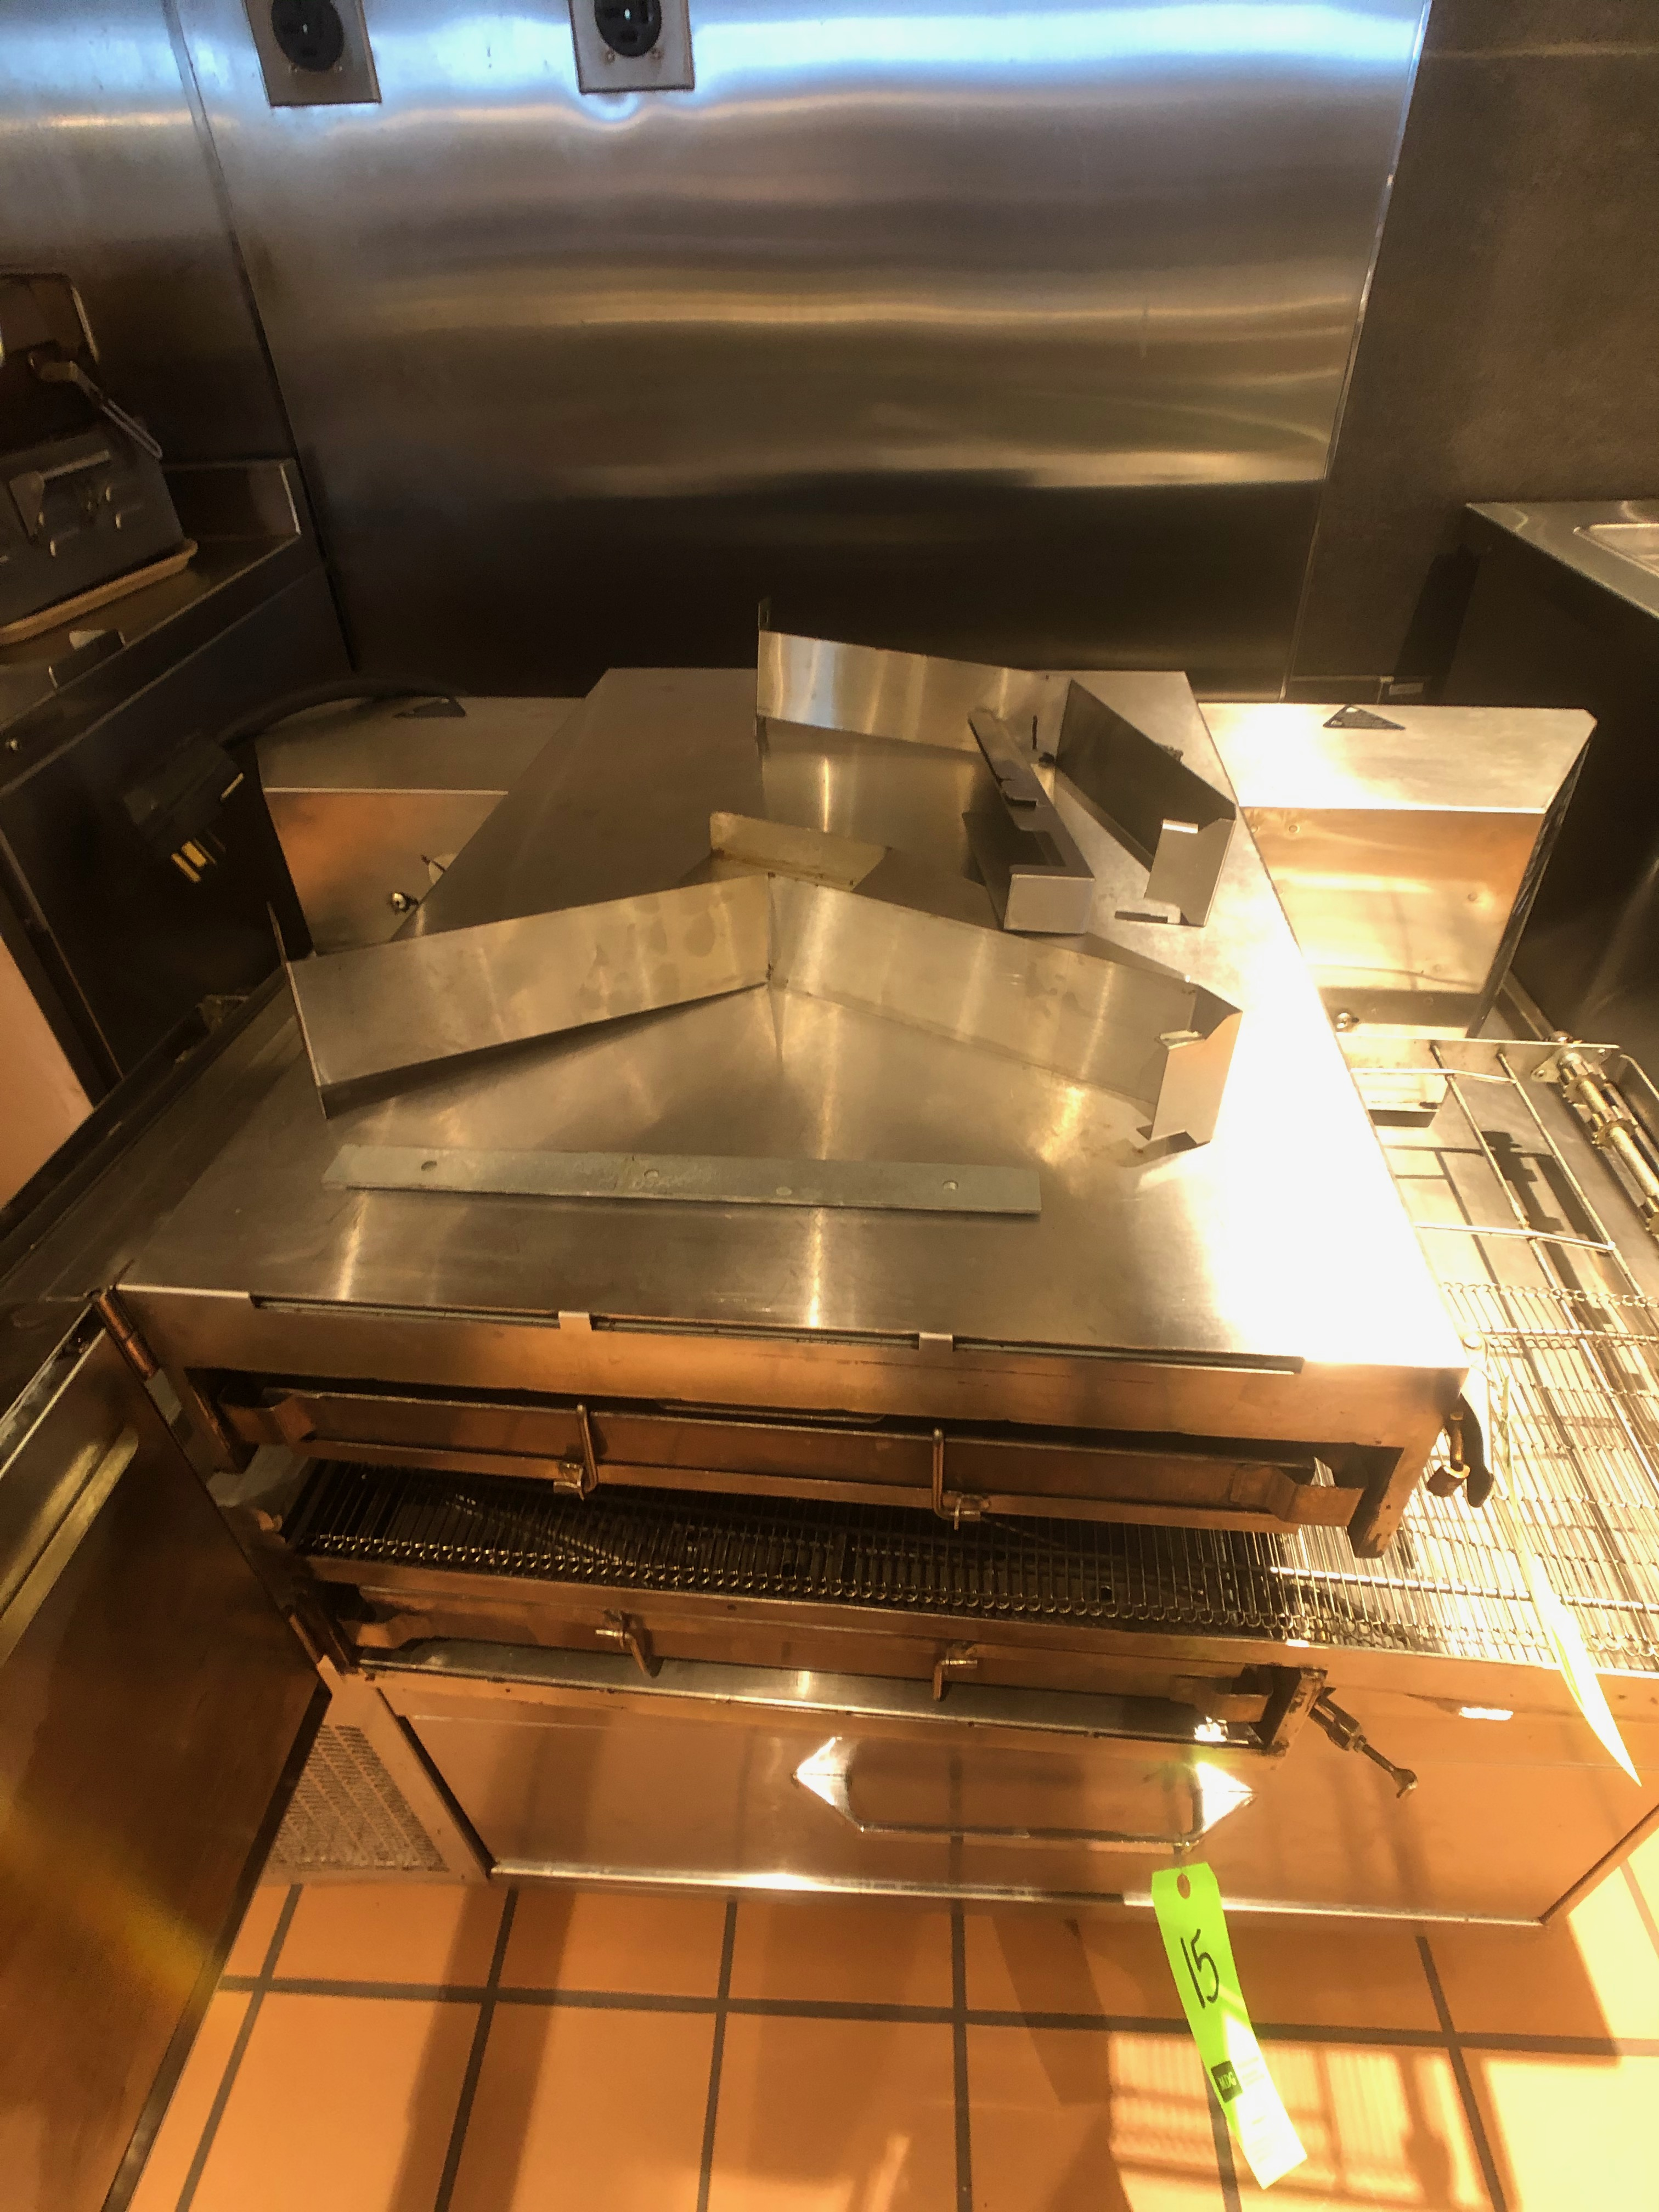 TurboChef Conveyor Oven, Model HHC2020, S/N HHC2020ED06665 - Image 6 of 7